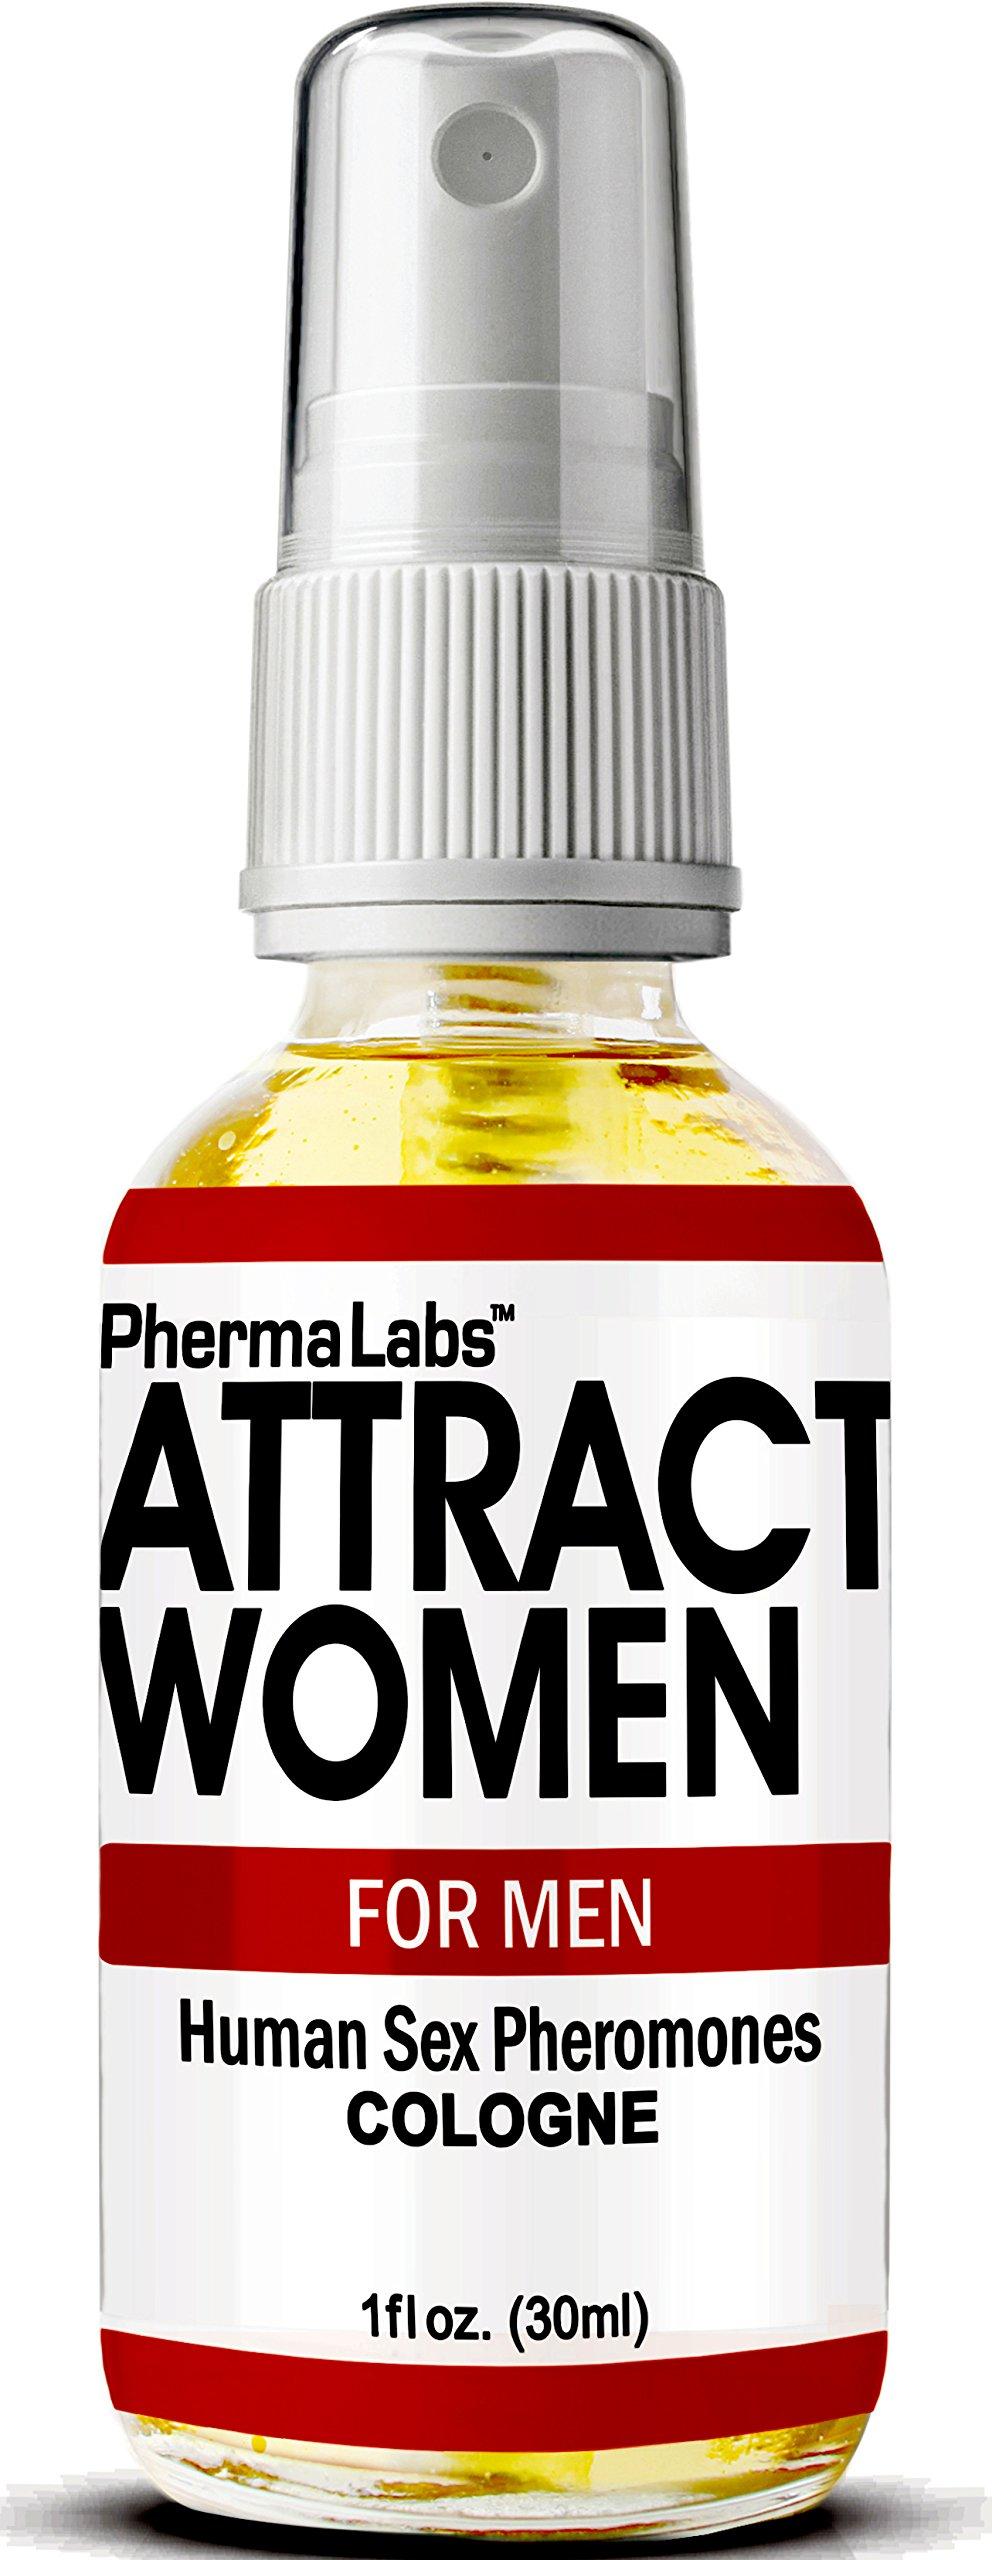 Pheromones The Secret to Instantly ATTRACT Beautiful WOMEN - Phermalabs Human Sex Premium Pheromone COLOGNE GUARANTEED! TO WORK!! 1oz bottle #025